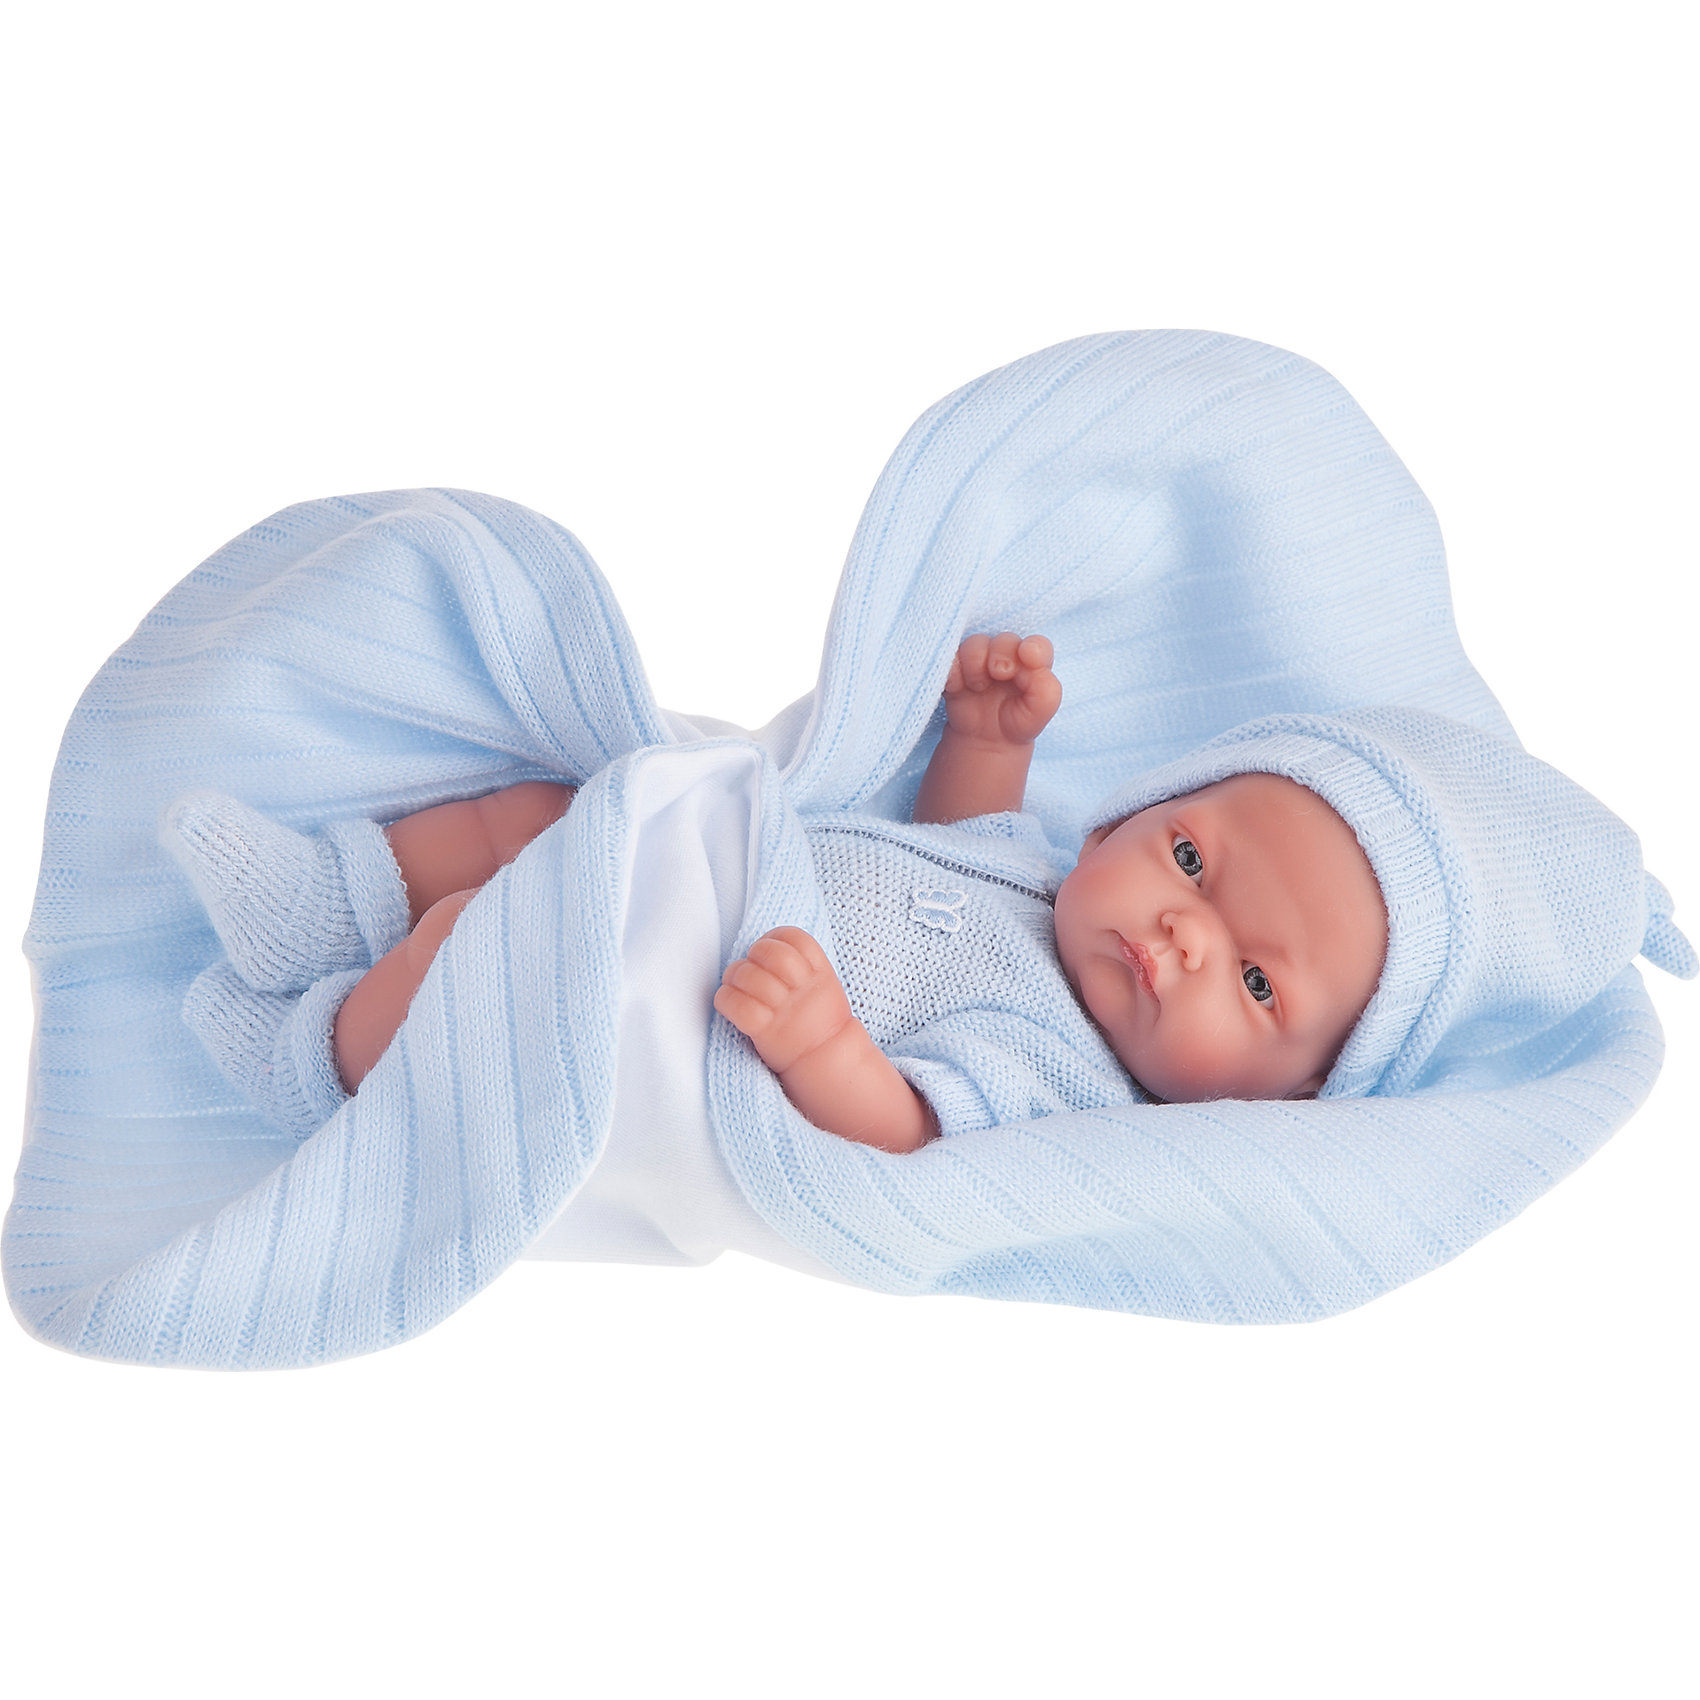 Munecas Antonio Juan Кукла-младенец Карлос в голубом одеяле, 26 см, Munecas Antonio Juan munecas antonio juan кукла младенец карлос в конверте голубой 26 см munecas antonio juan